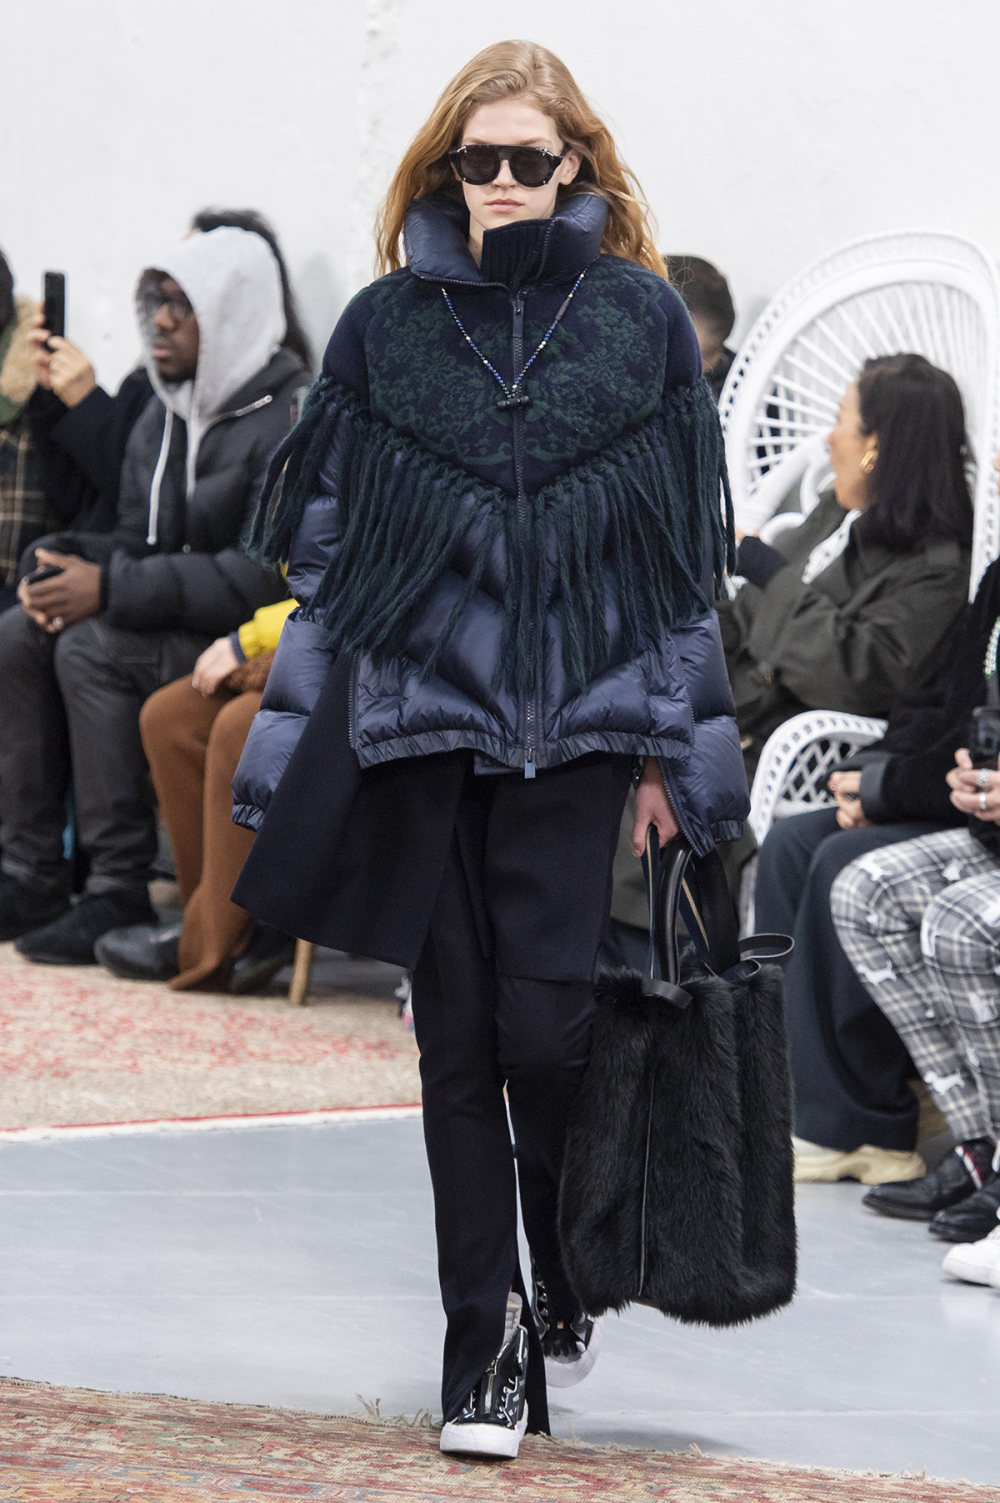 Sacai时装系列超大号黑色圆领毛衣和长款绿色北欧毛衣连衣裙-19.jpg